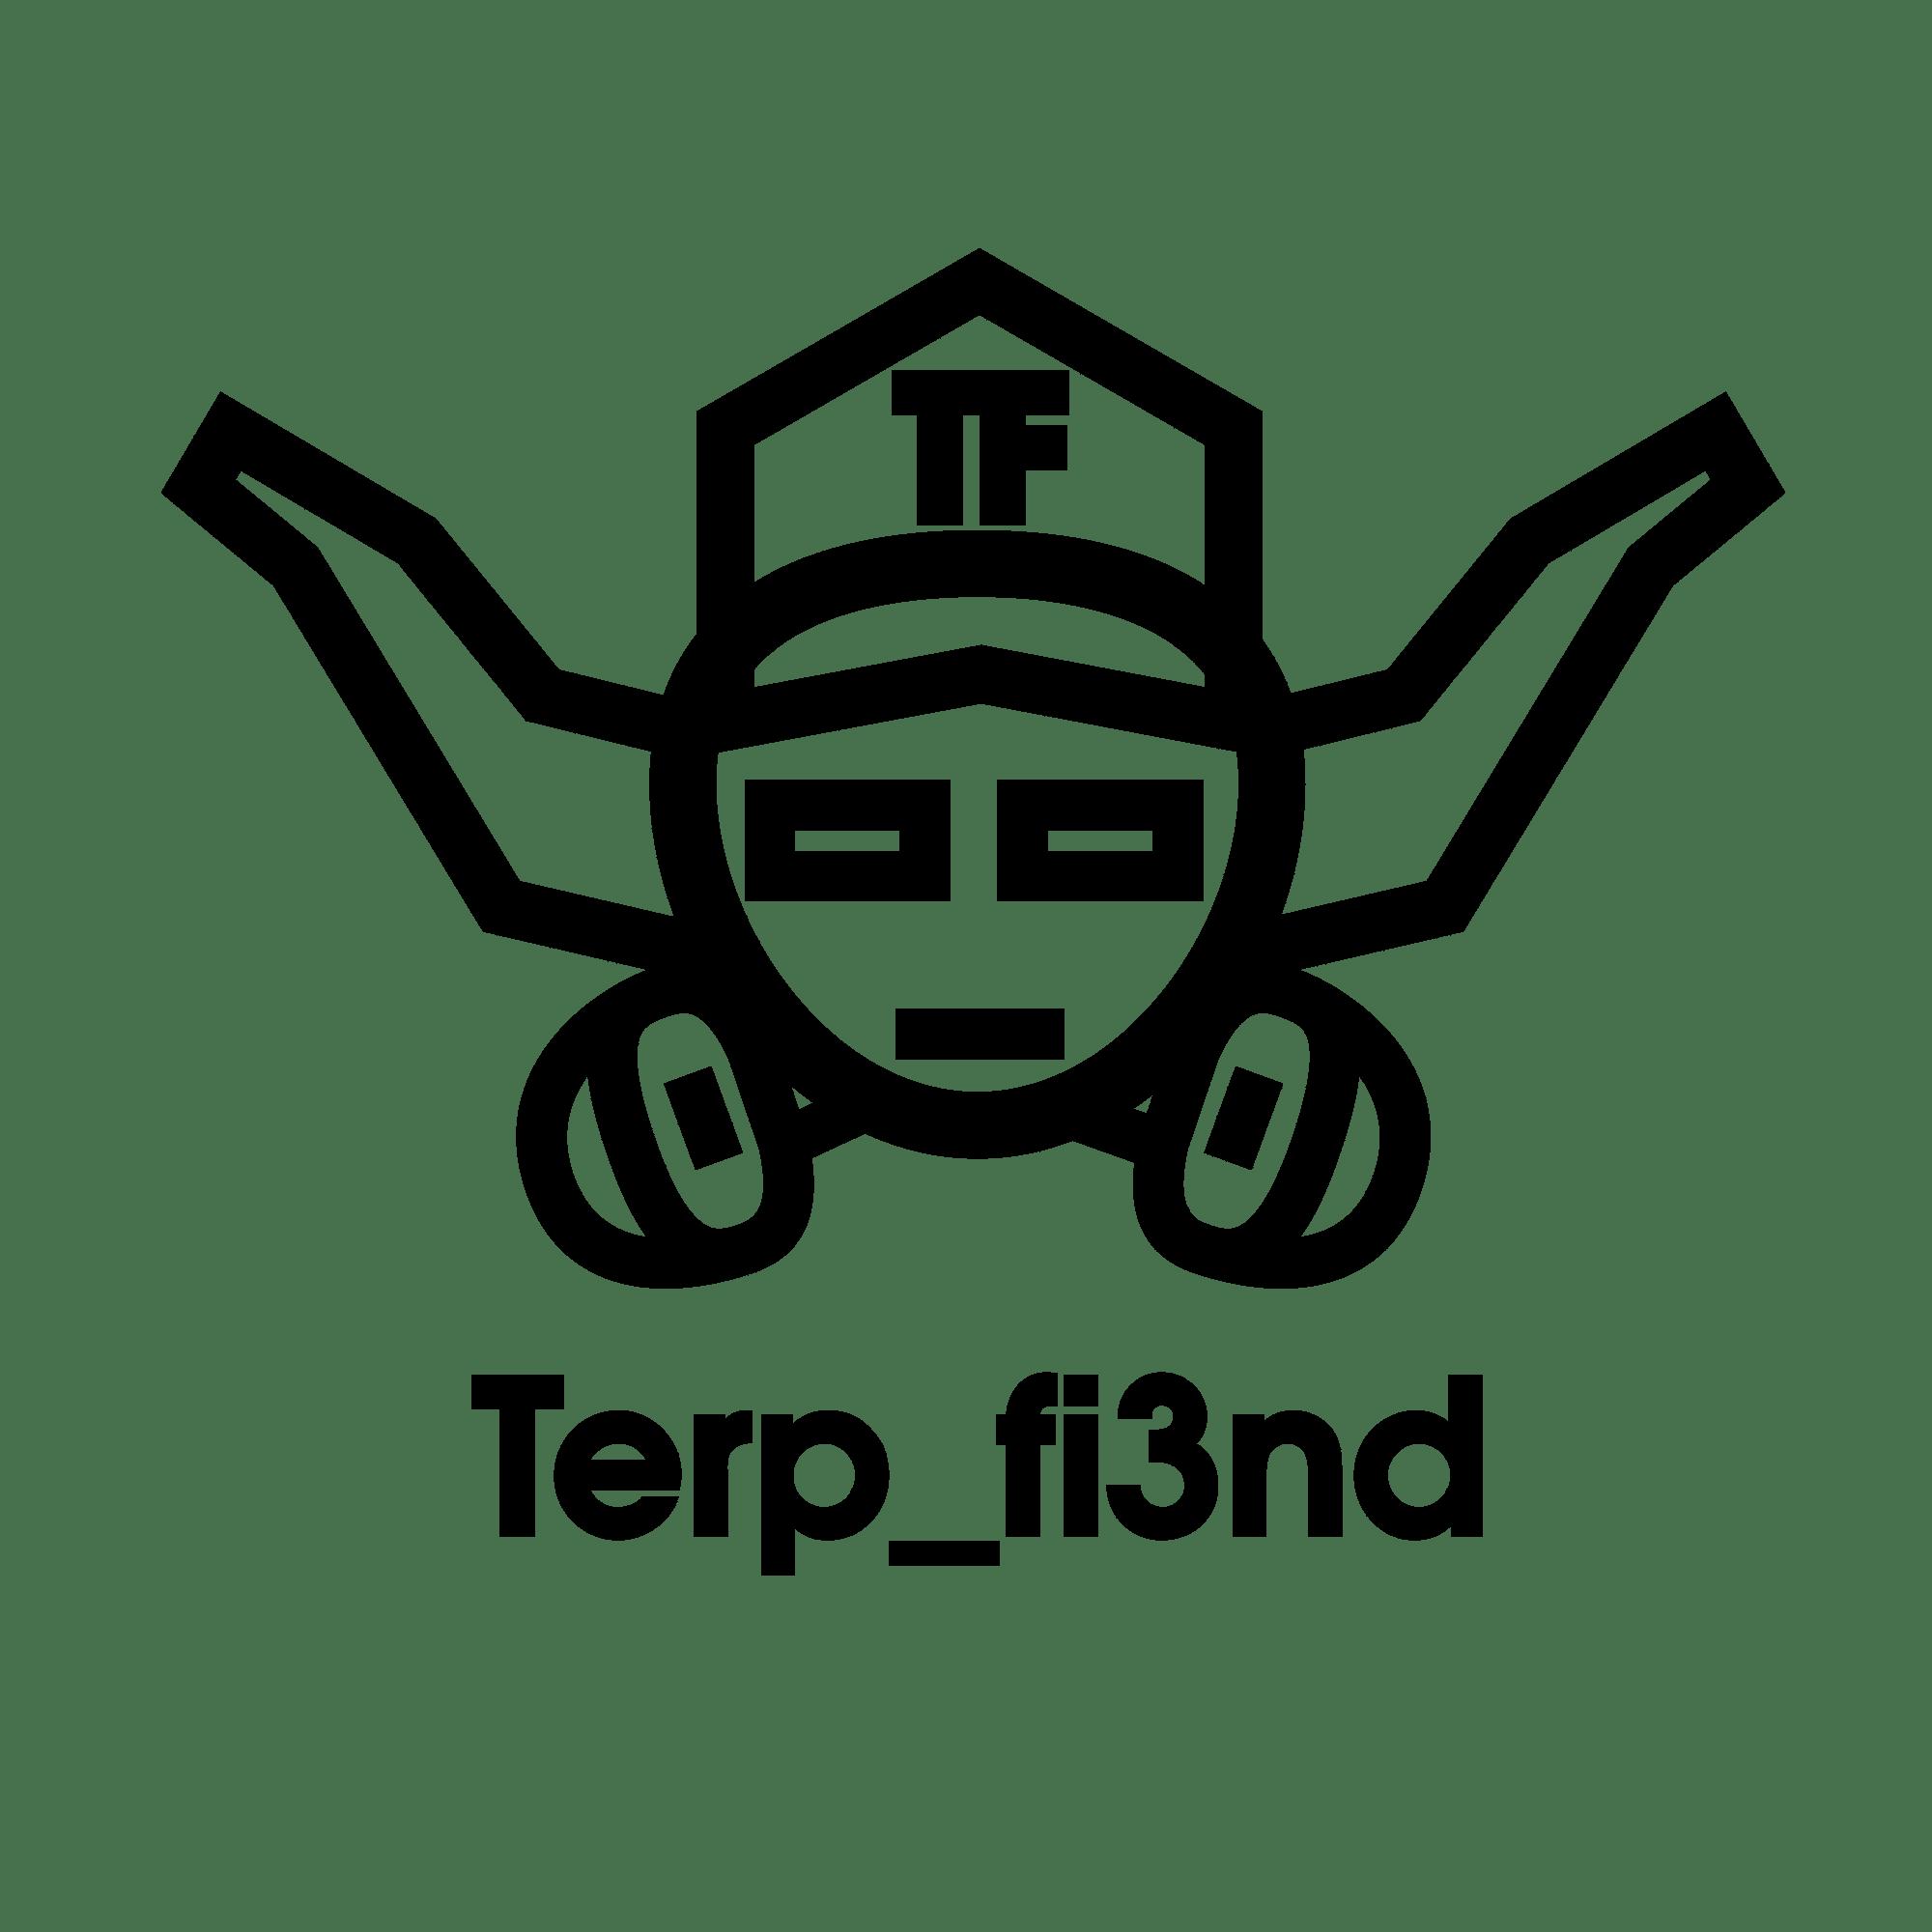 terpfi3nd genetics